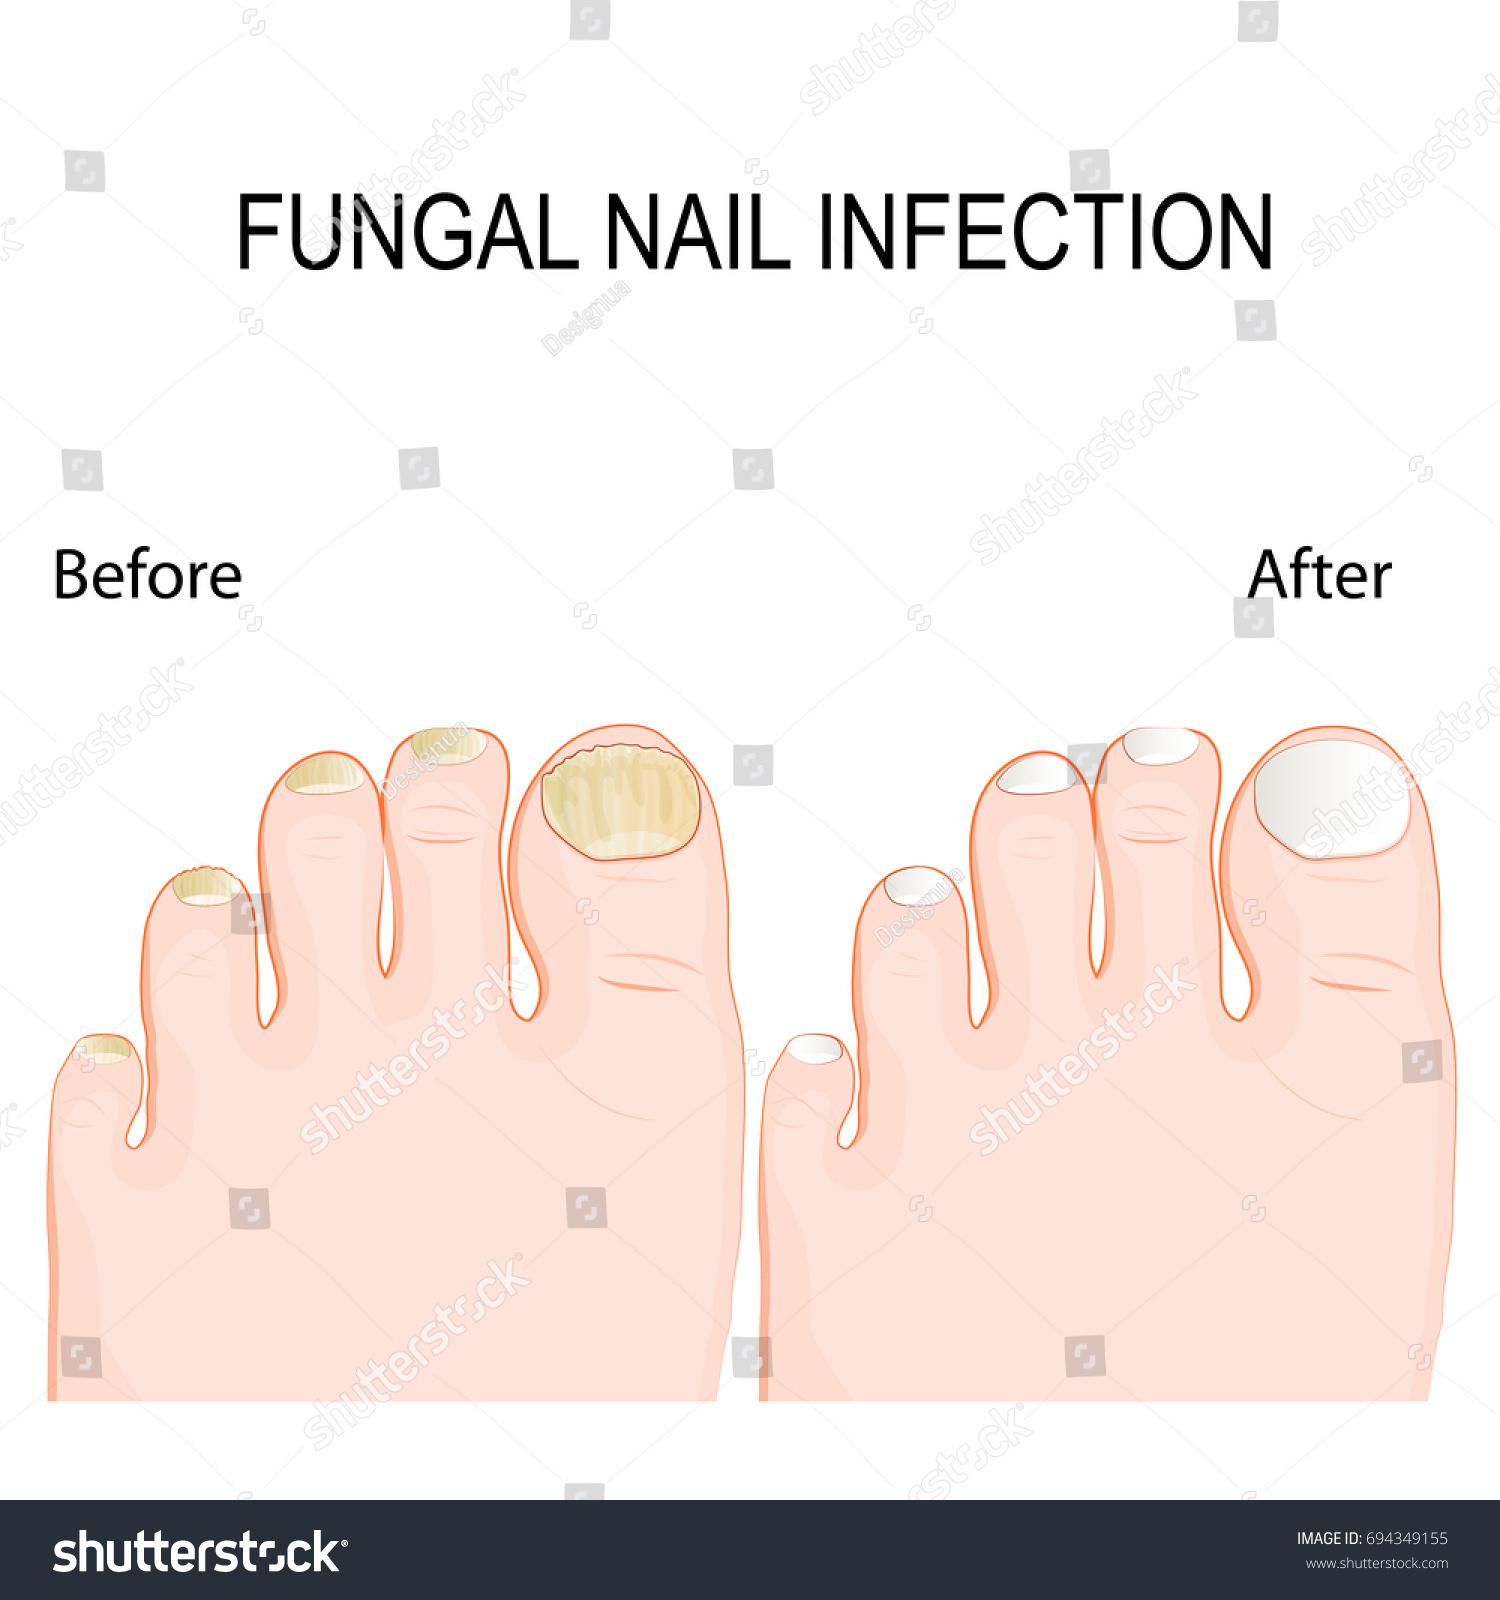 Fungal Nail Infection Onychomycosis Tinea Unguium Stock Photo (Photo ...